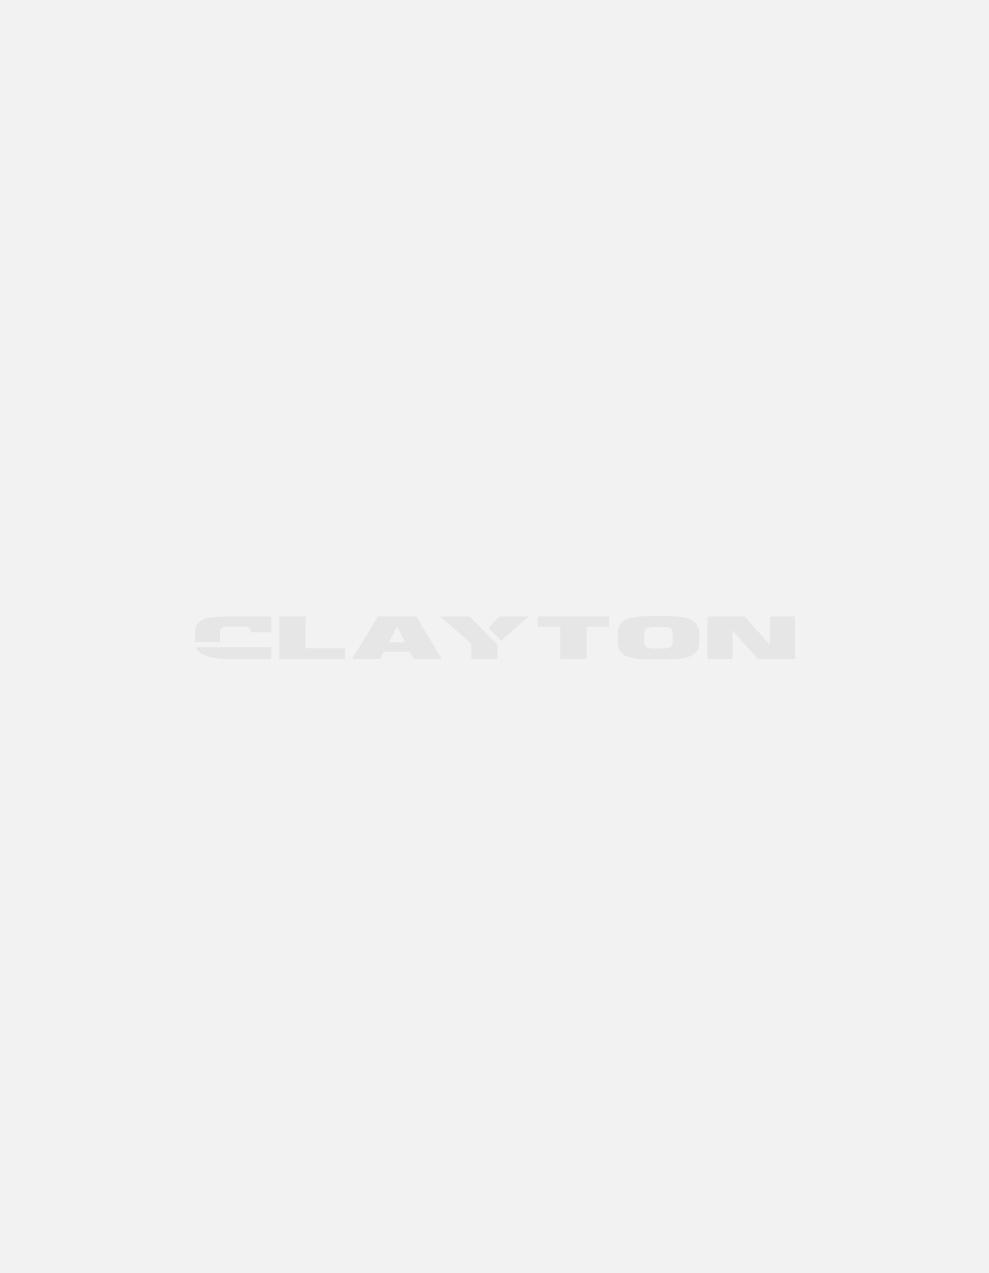 https://www.claytonitalia.com/media/catalog/product/cache/5/small_image/460x590/9df78eab33525d08d6e5fb8d27136e95/g/i/gift53_nt.jpg